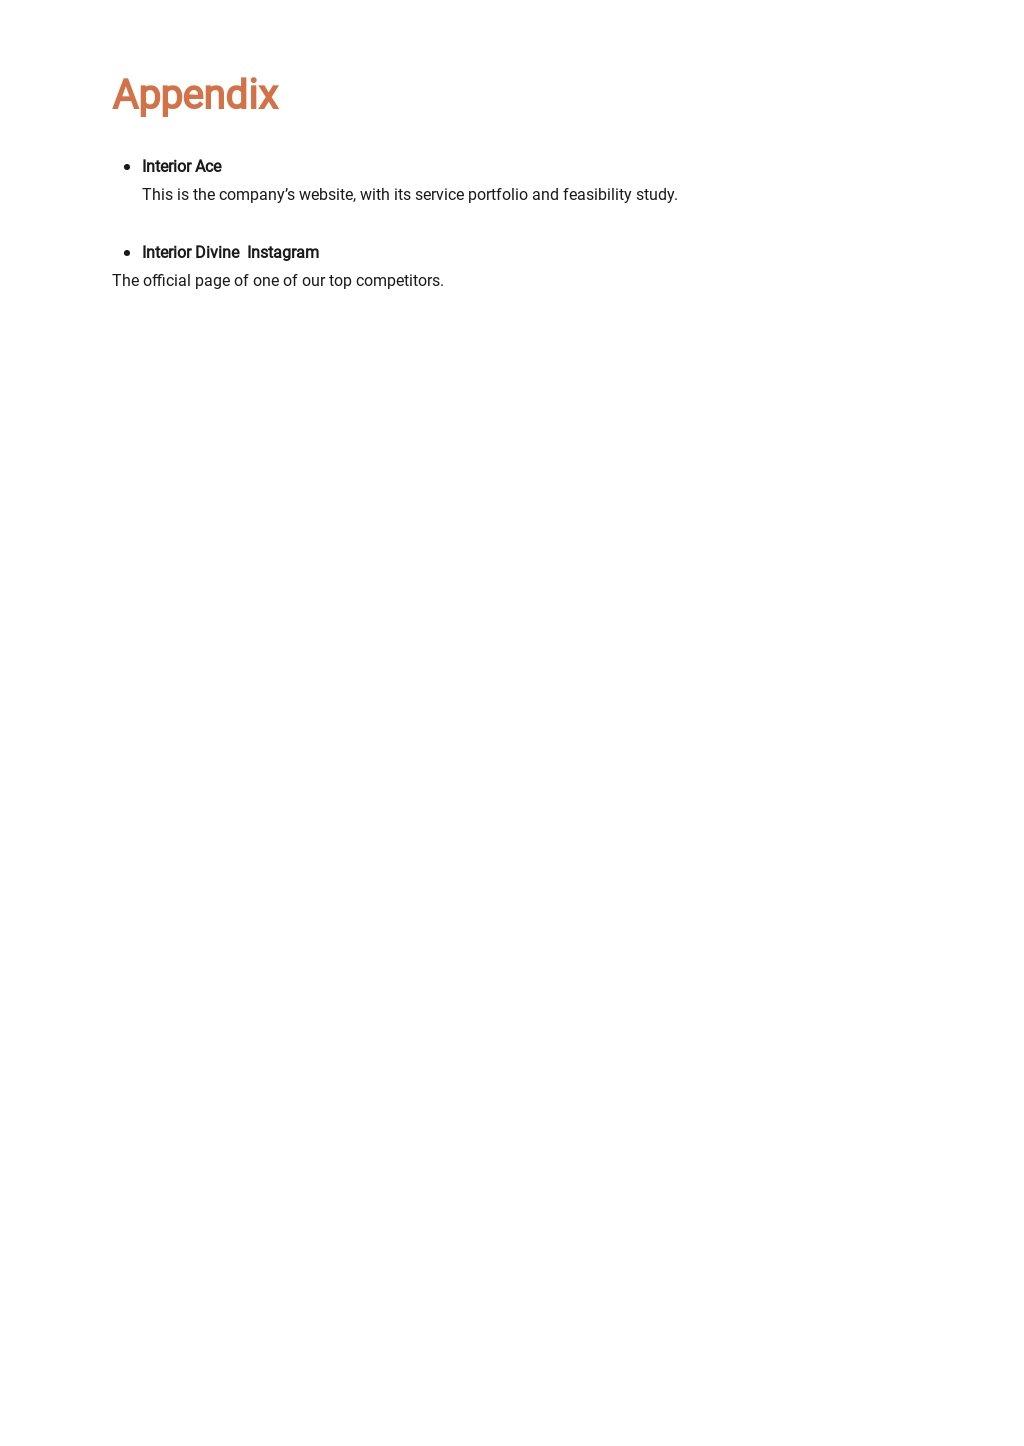 Home Interior Design Business Plan 9.jpe